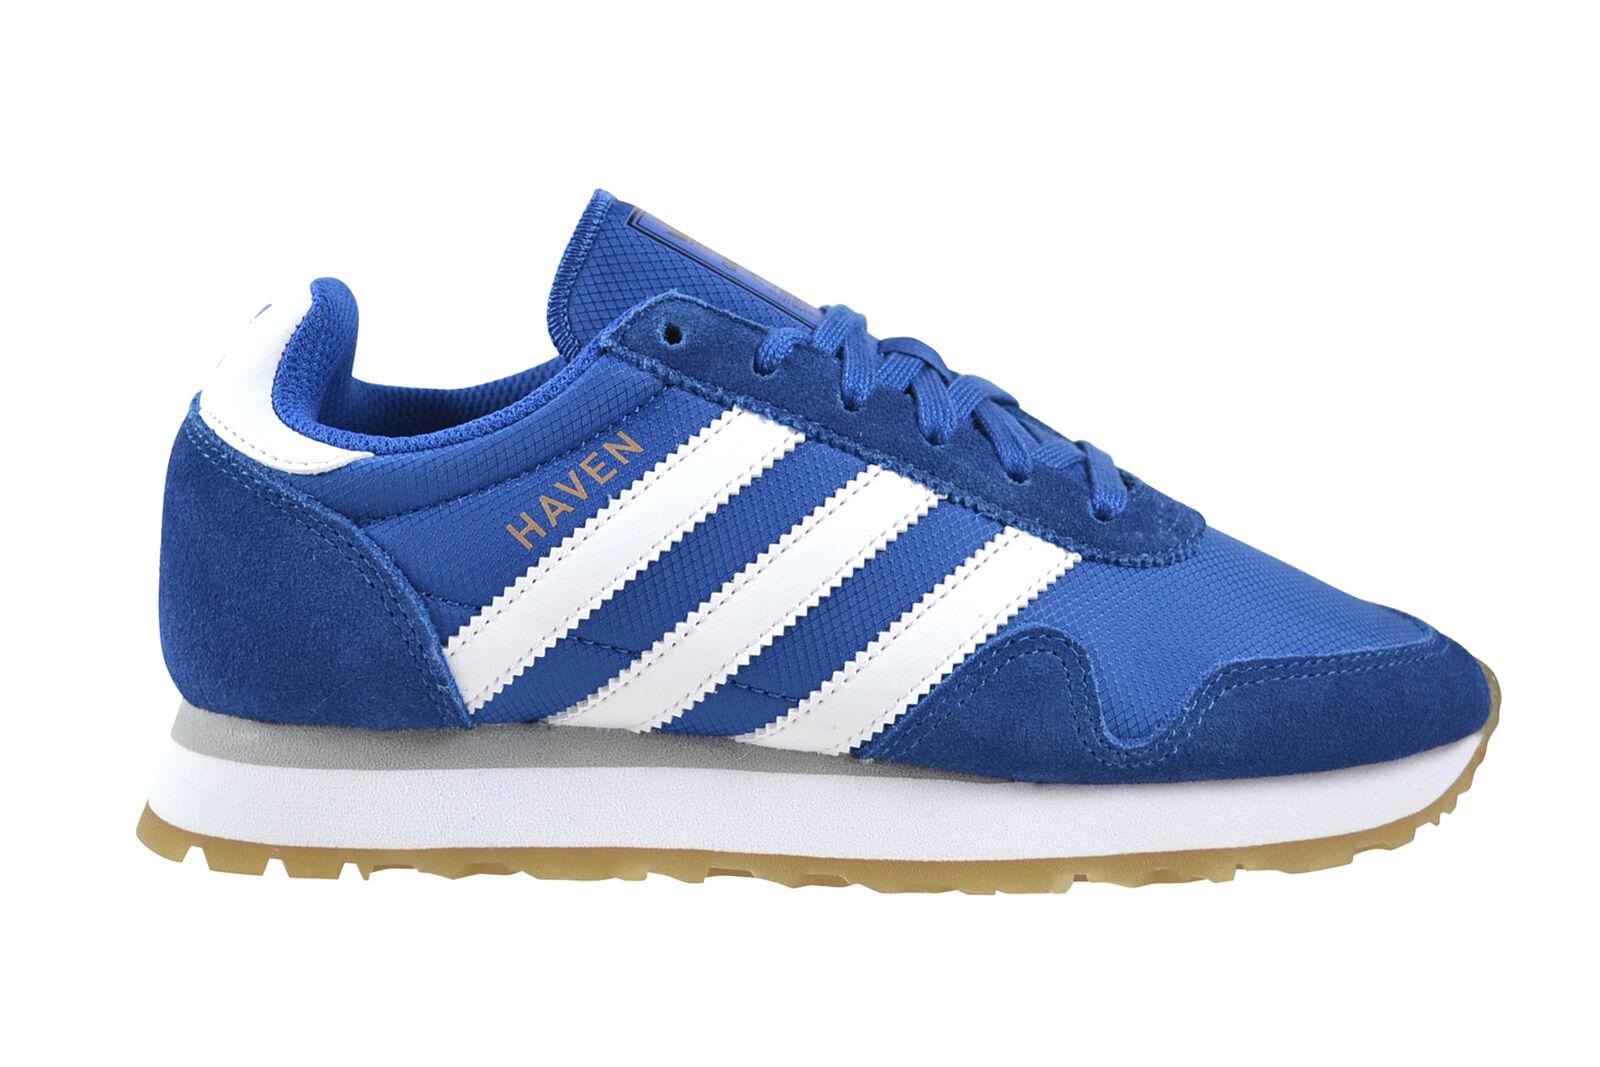 Adidas Haven Blau Weiß gum Turnschuhe Schuhe blau BY9716